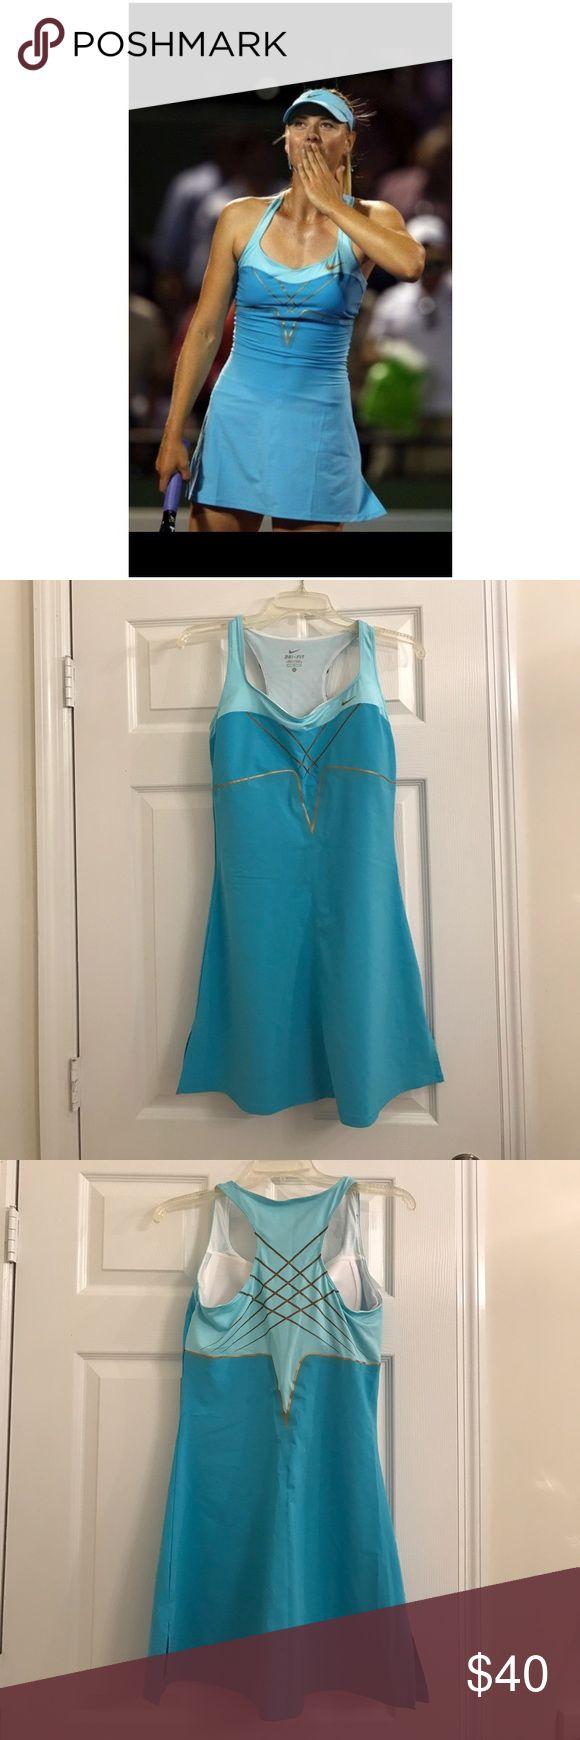 Maria sharapova miami open tennis dress Blue and gold miami open, comfortable tennis dress Nike Dresses Mini